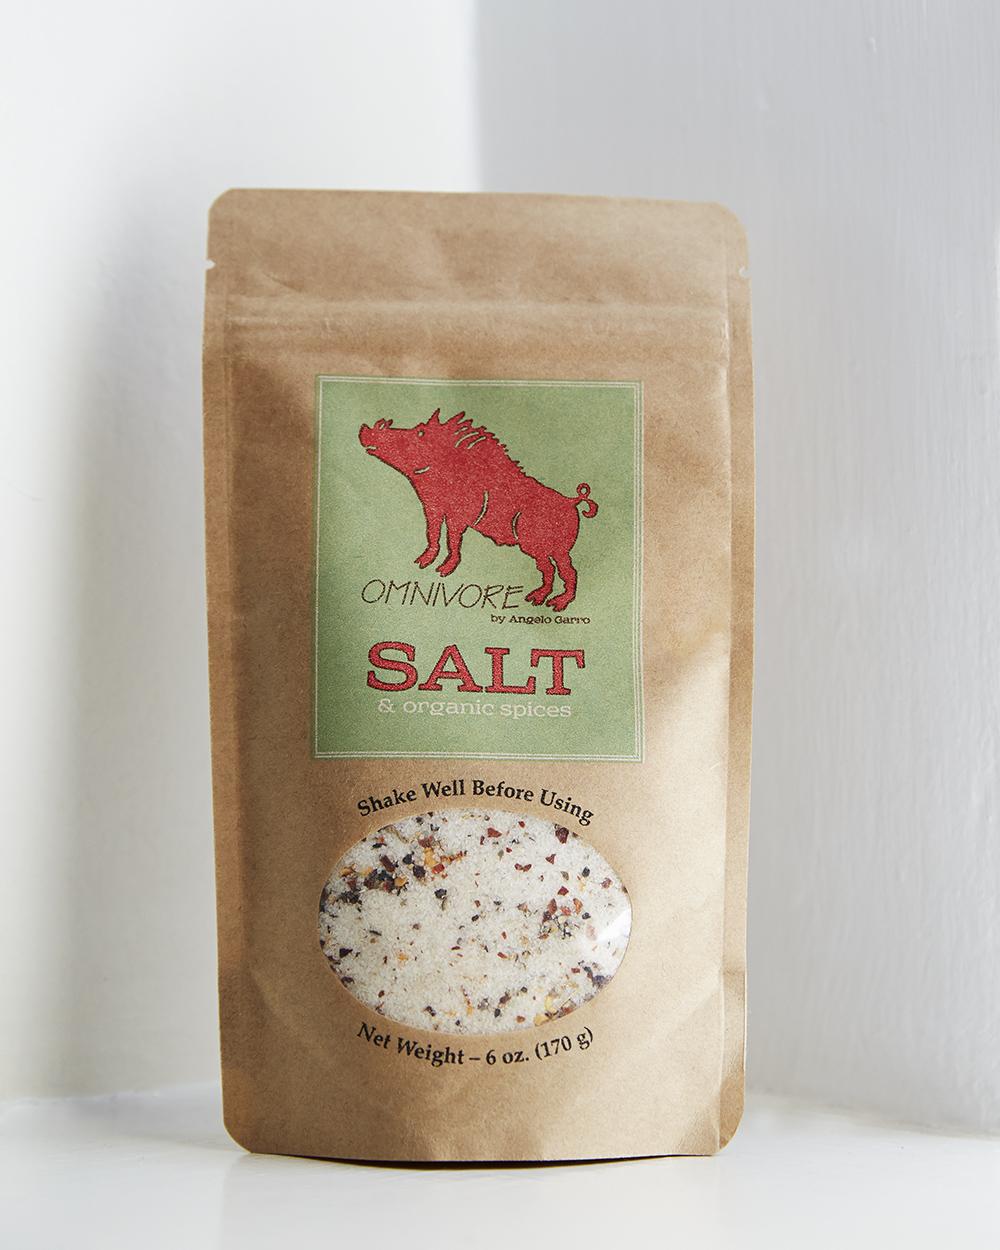 Omnivore Salt. Photo: Laurie Frankel